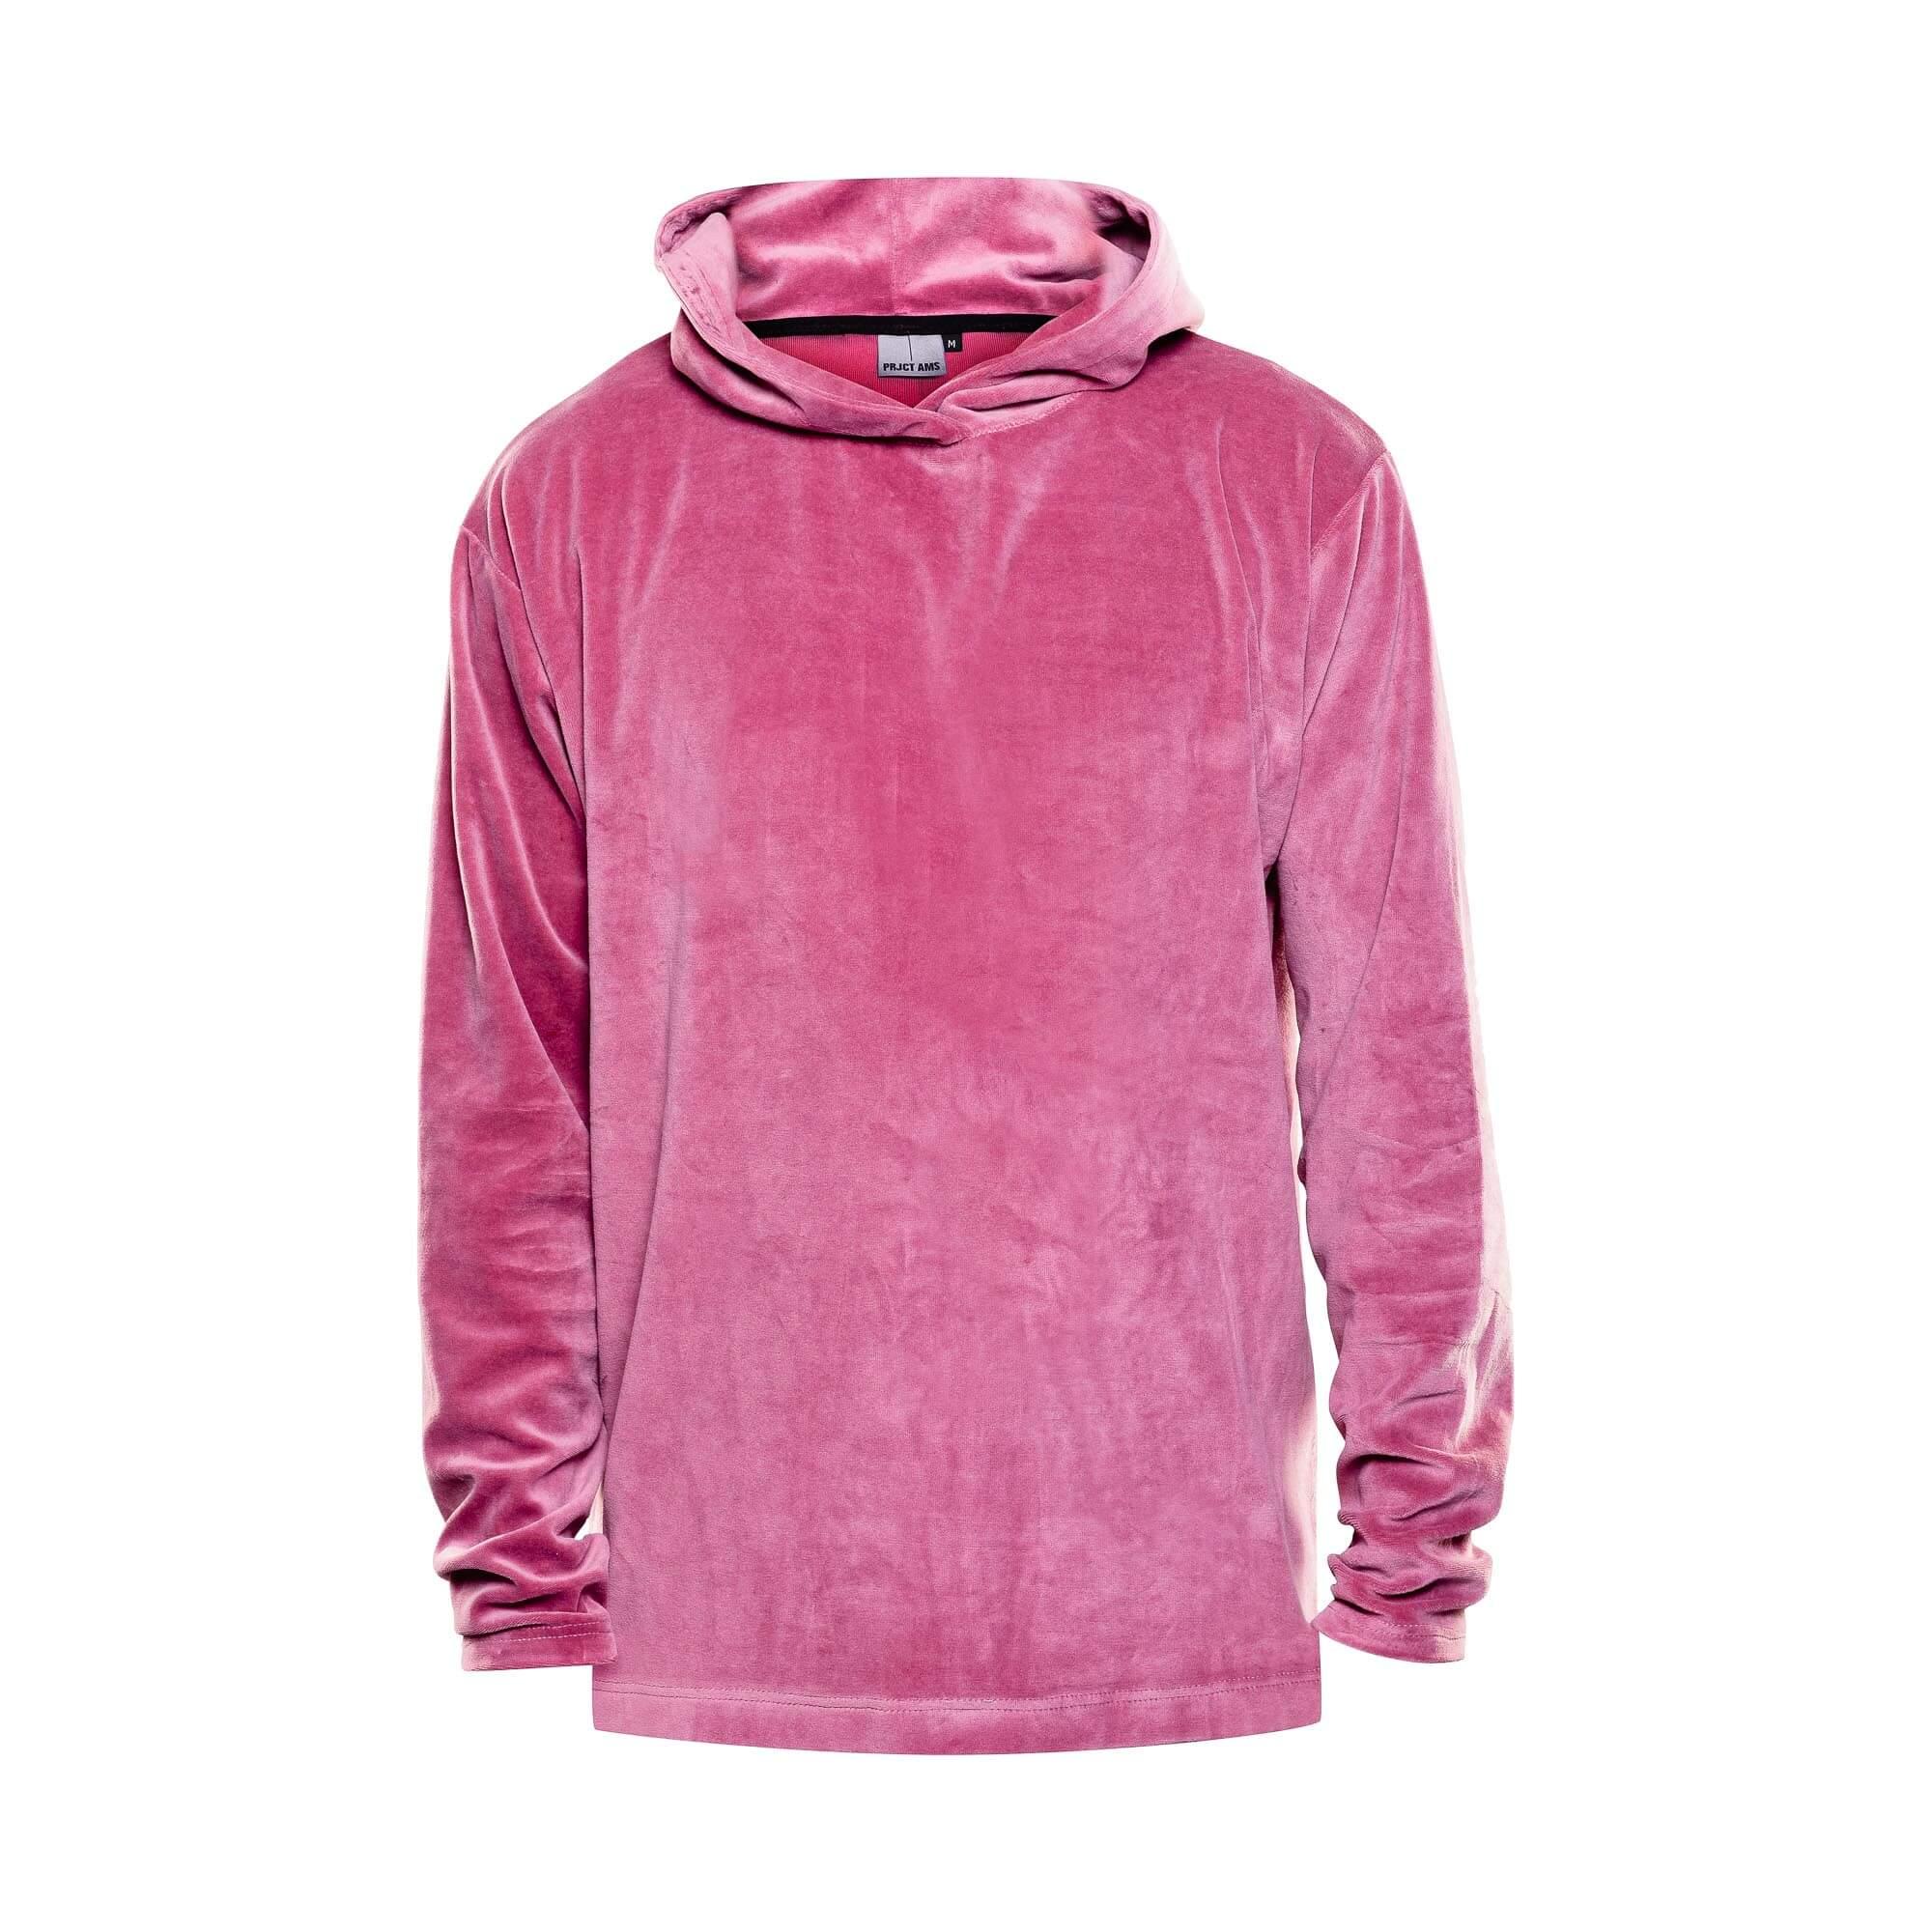 Hoodie velvet roze